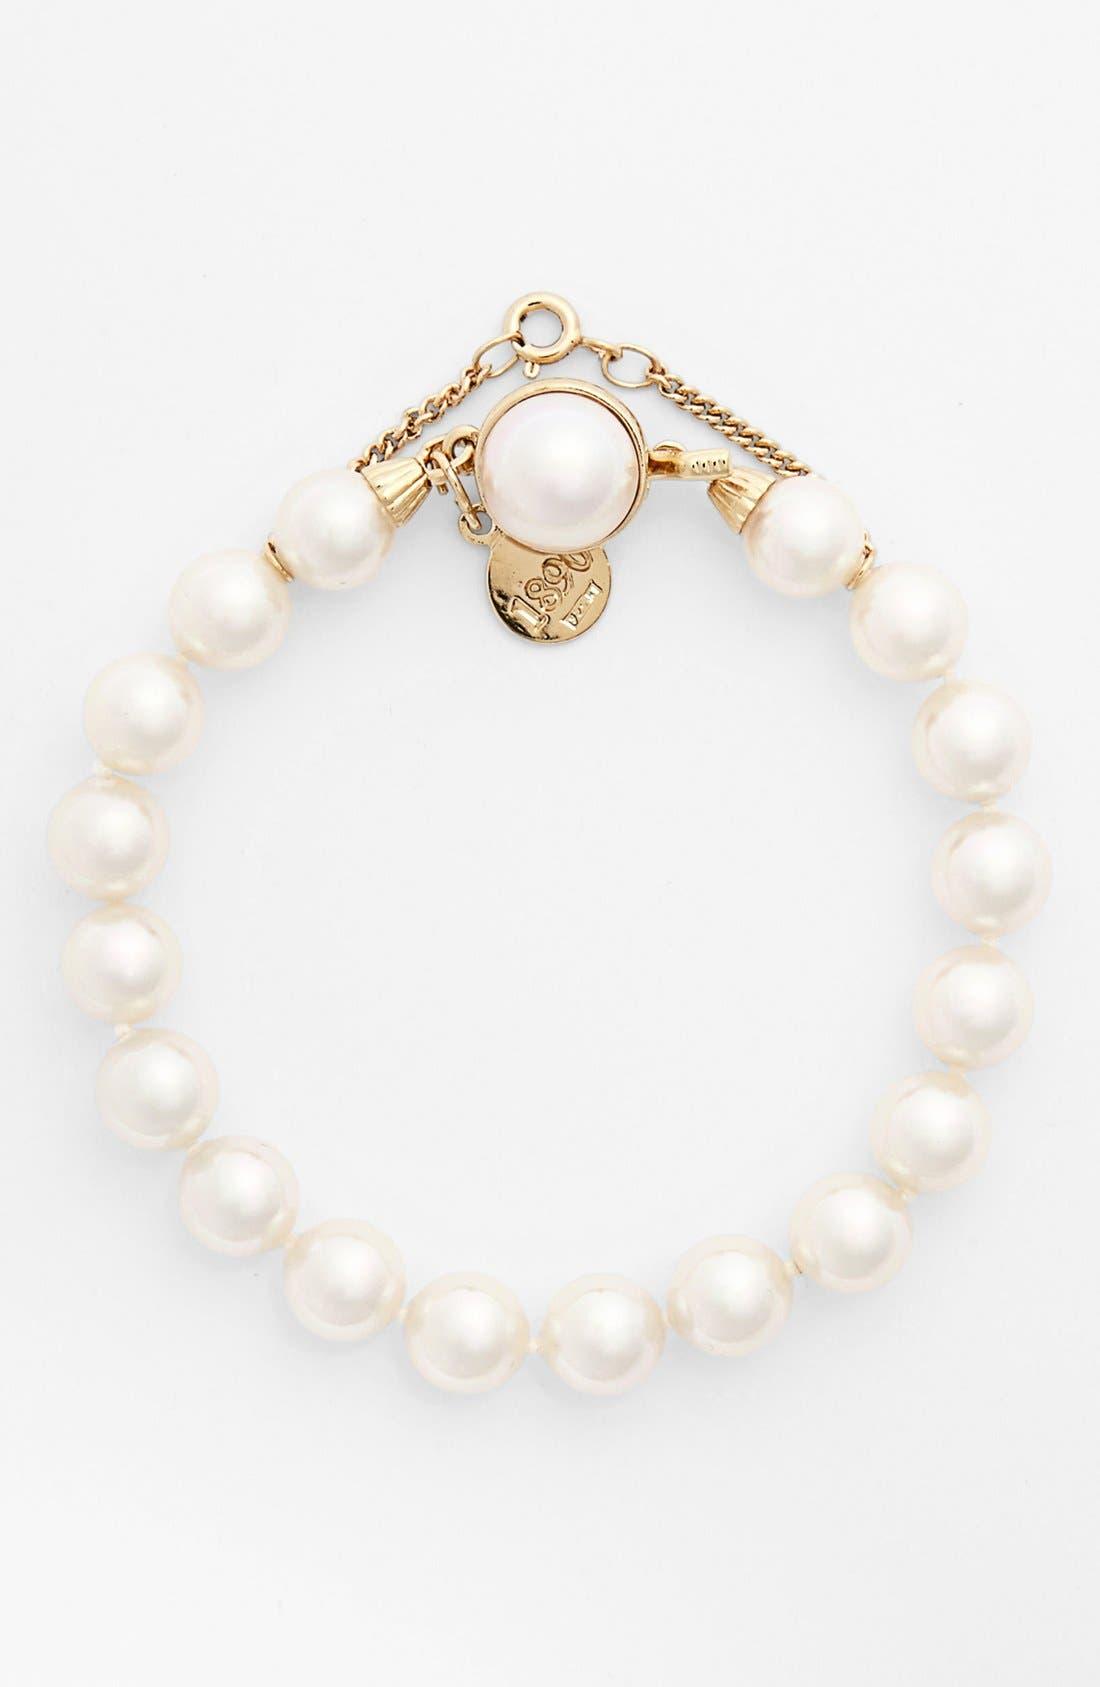 8mm Single Row Pearl Bracelet,                             Main thumbnail 1, color,                             WHITE/ GOLD